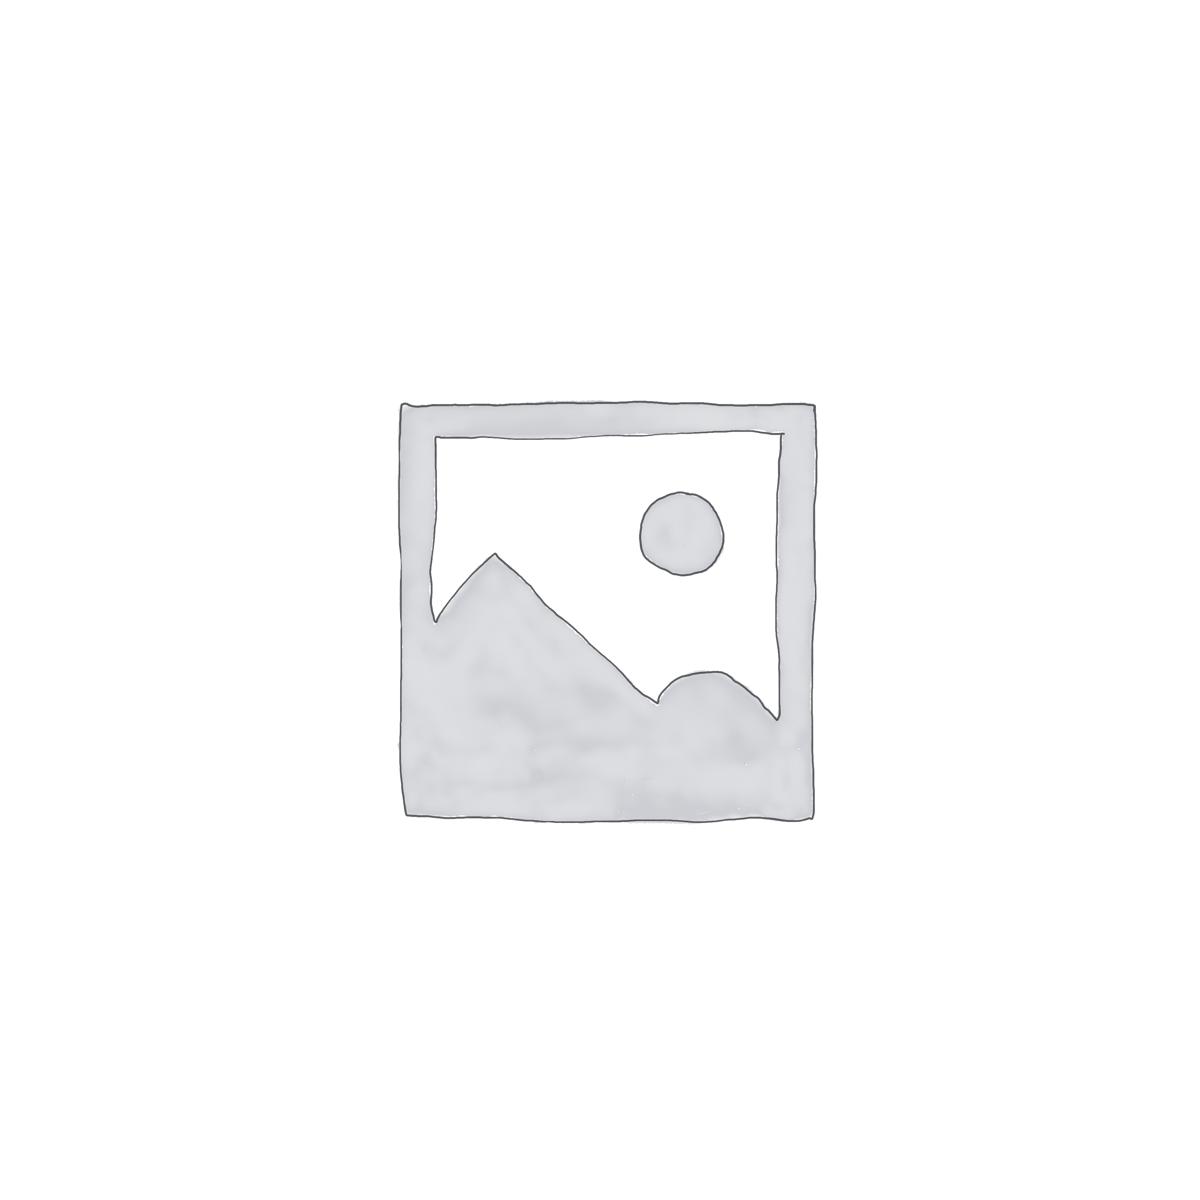 woocommerce placeholder - Велосипеды Stinger Стингер в г. Краснодар, Краснодарский край